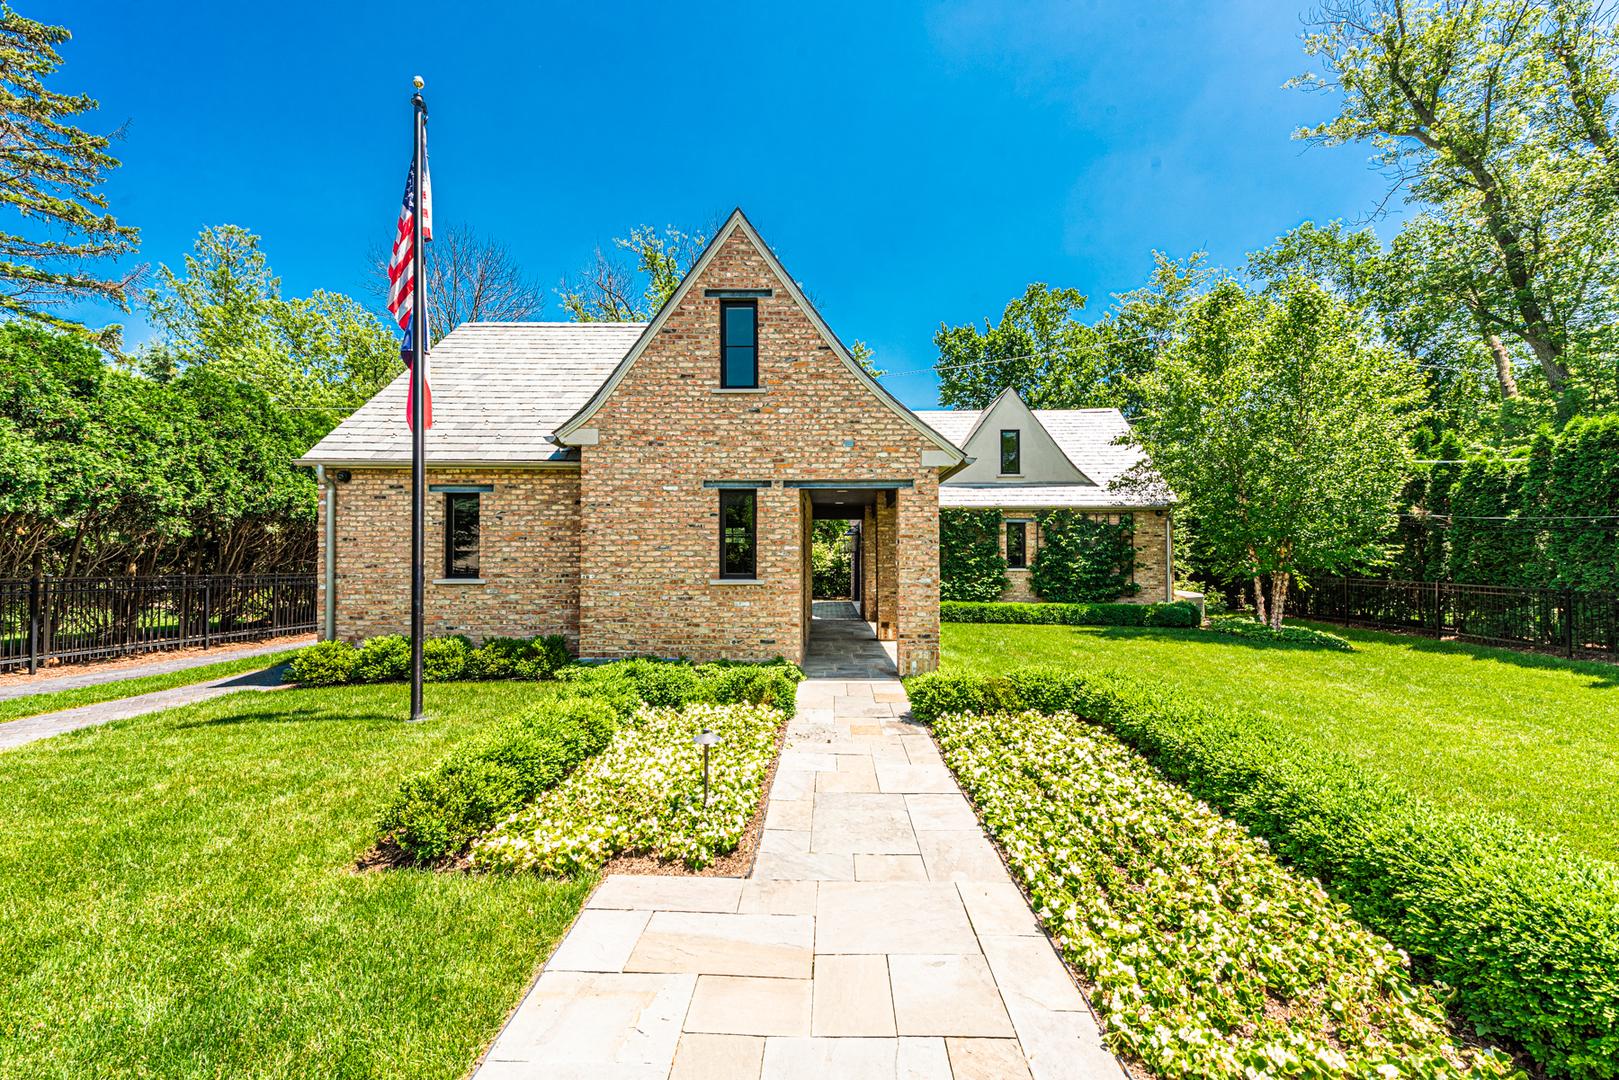 827 South Oak, Hinsdale, Illinois, 60521